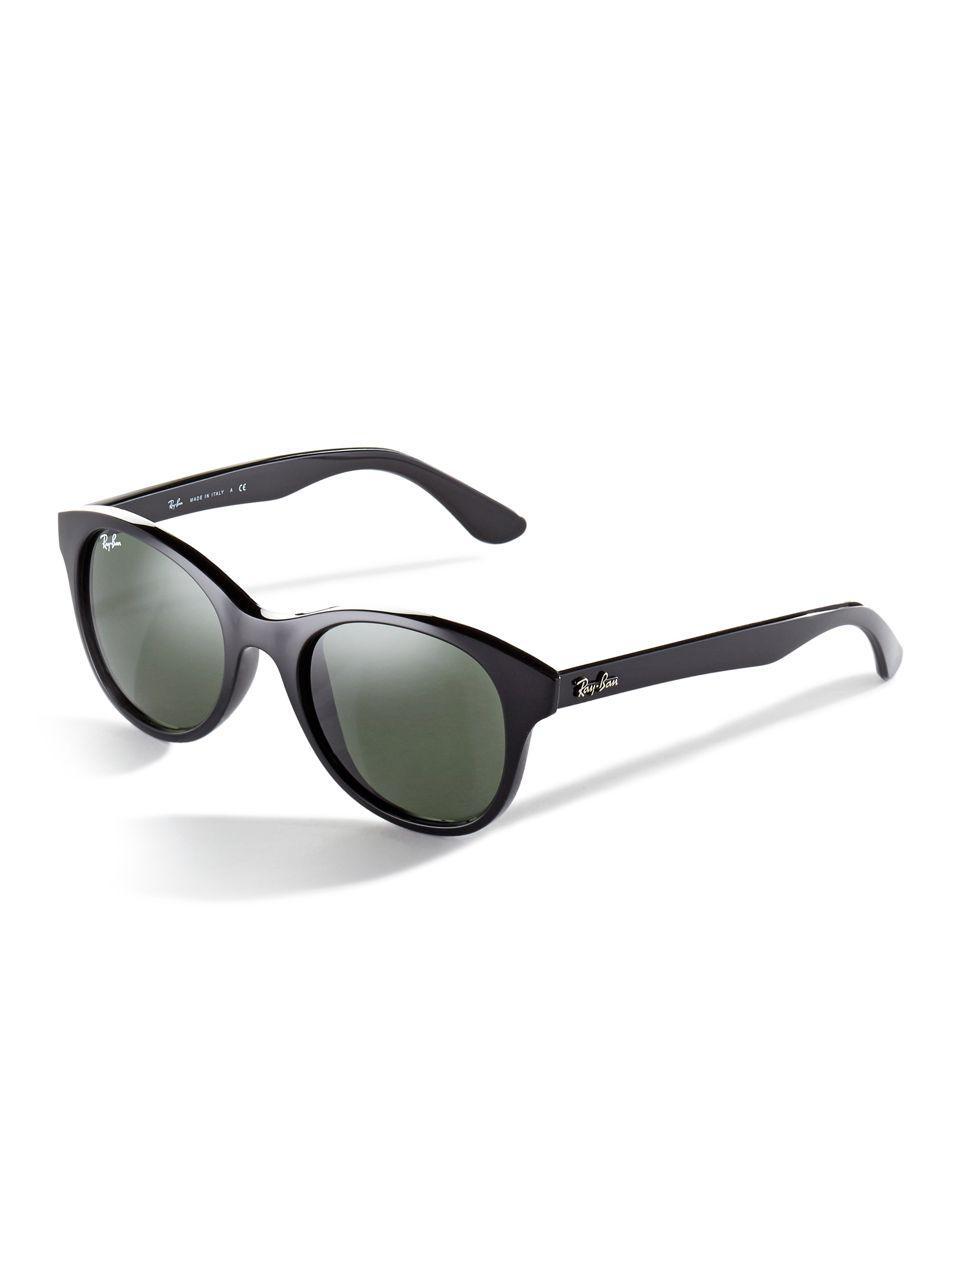 35b0d5a6b6 Lyst - Ray-Ban Rb4203 Wayfarer Sunglasses in Black